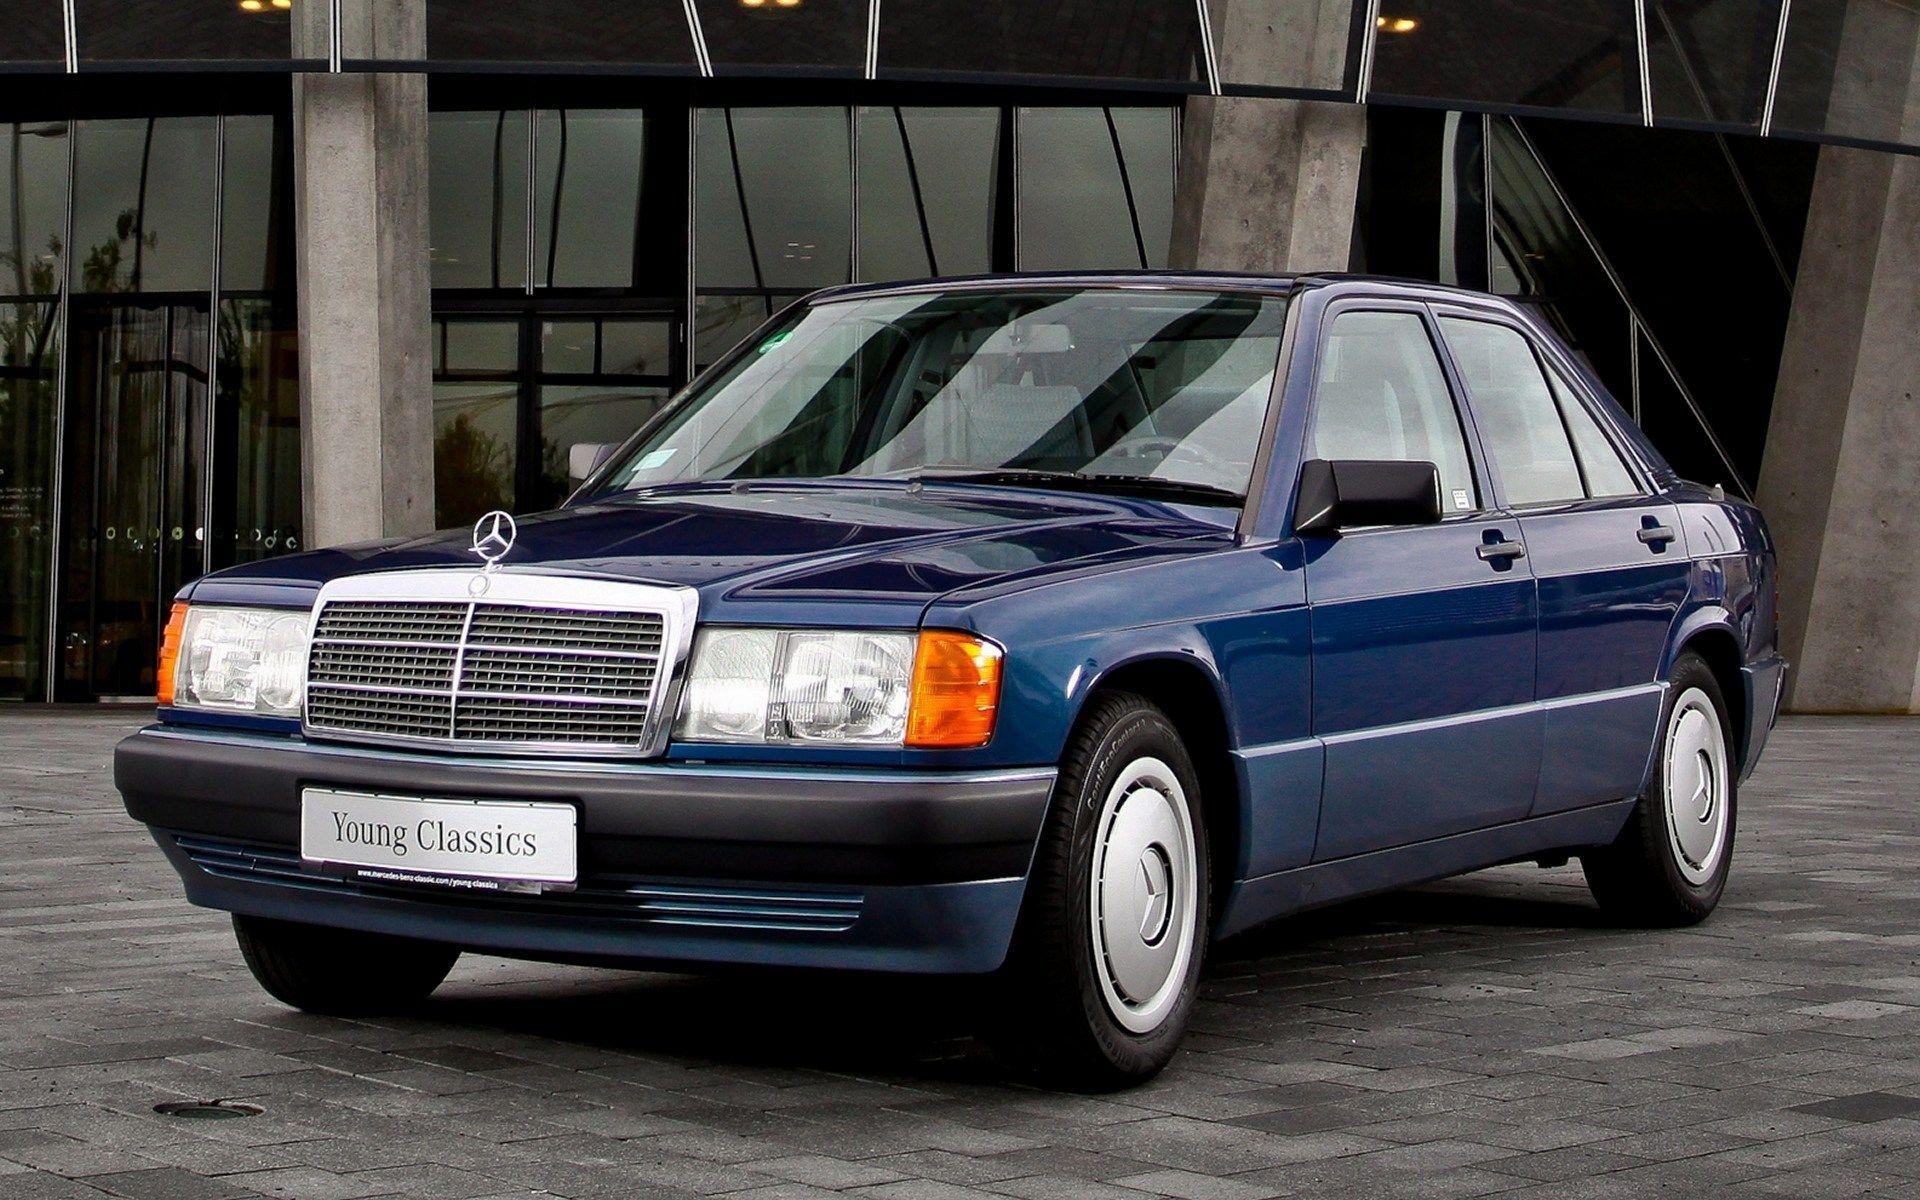 Mercedes-Benz W124 Wallpapers - Top Free Mercedes-Benz ...